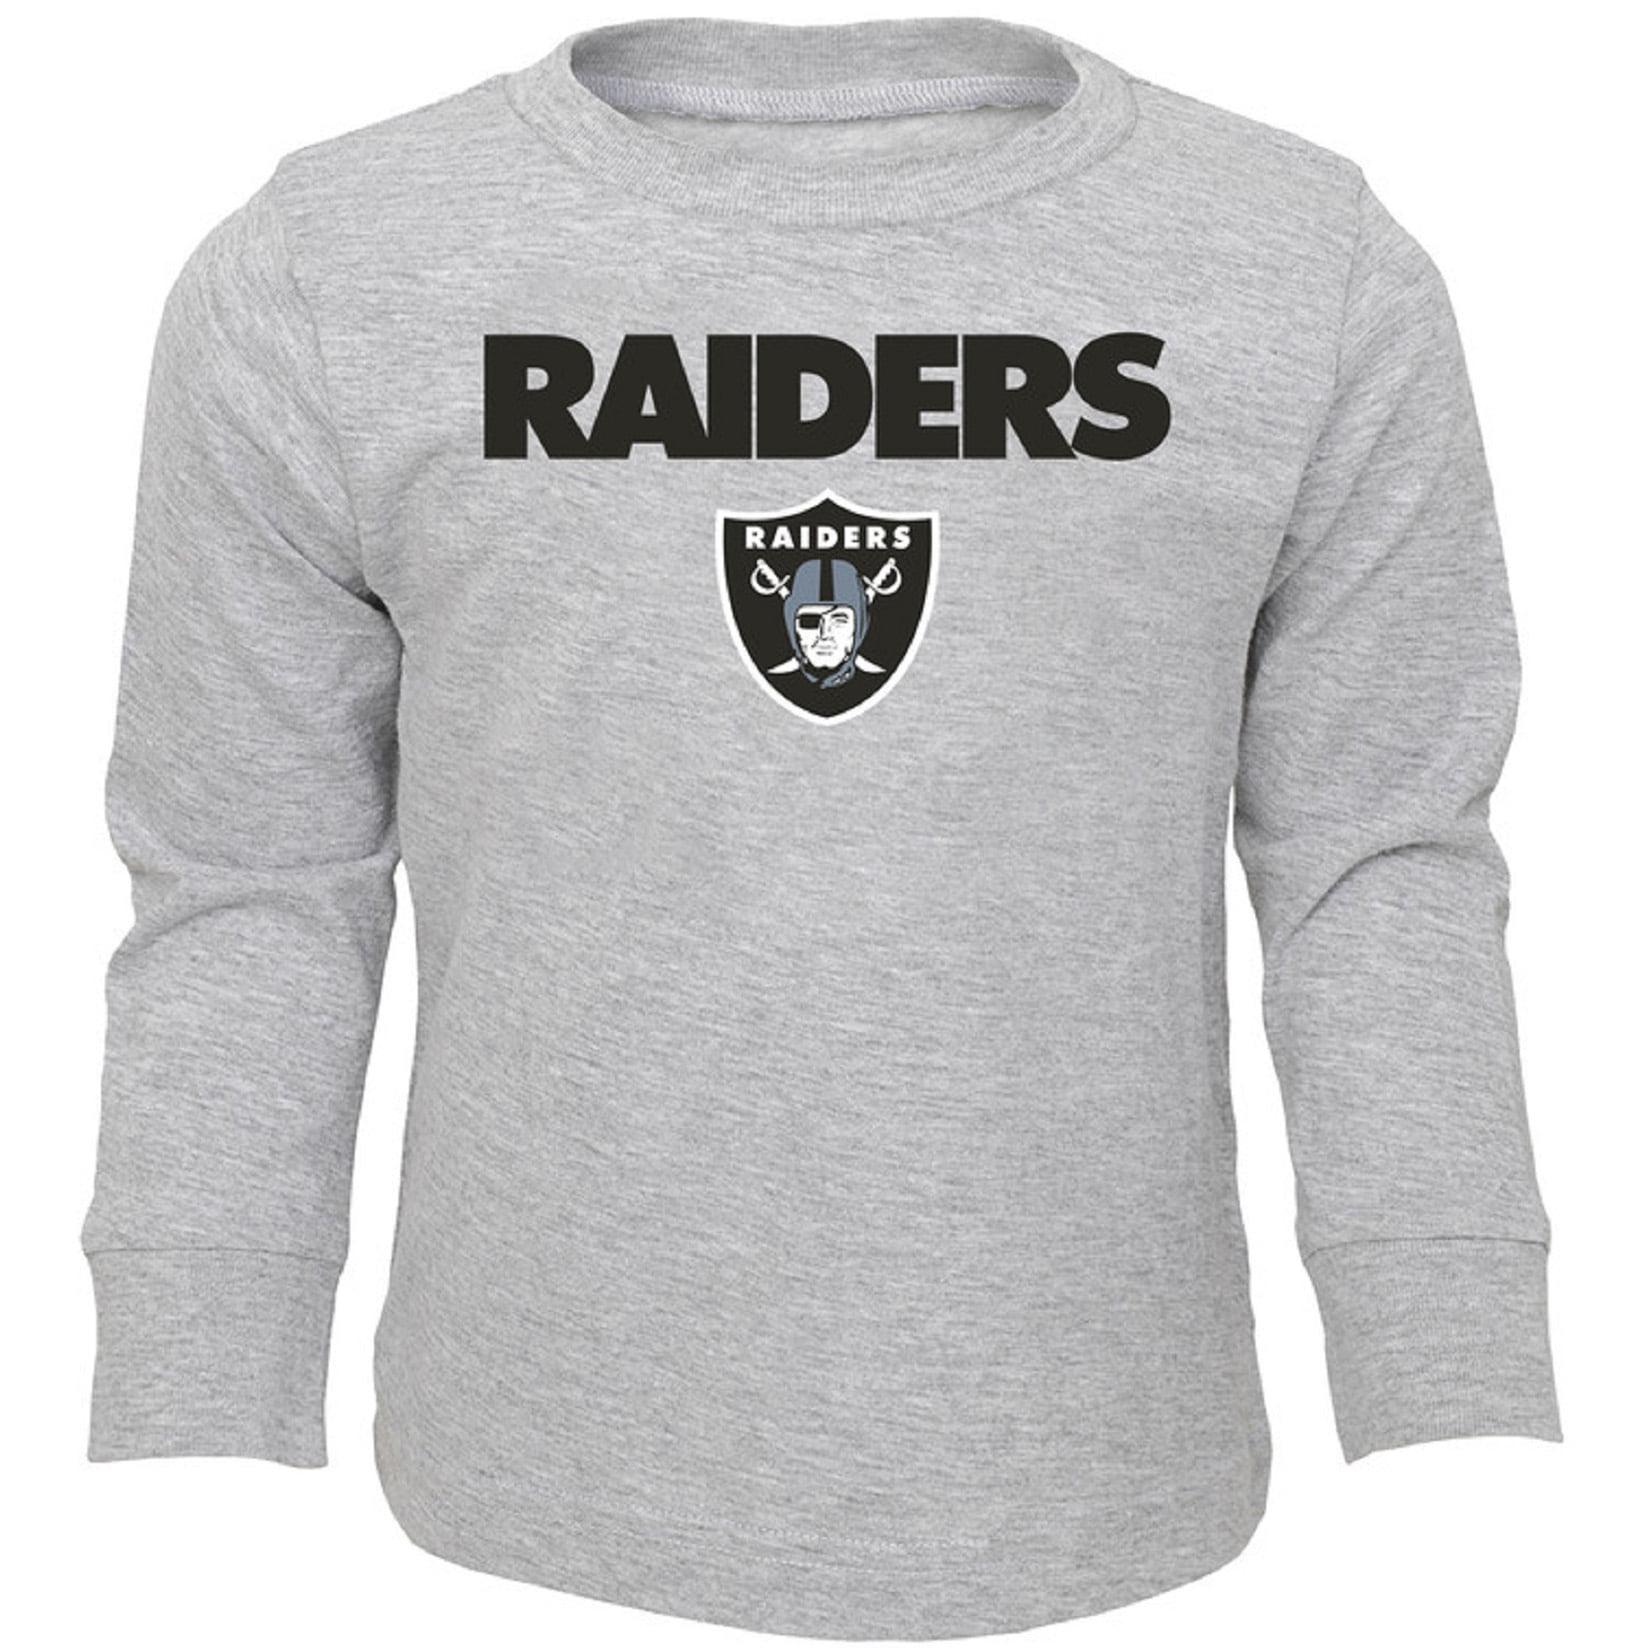 Toddler Heathered Gray Oakland Raiders Team Long Sleeve T-Shirt